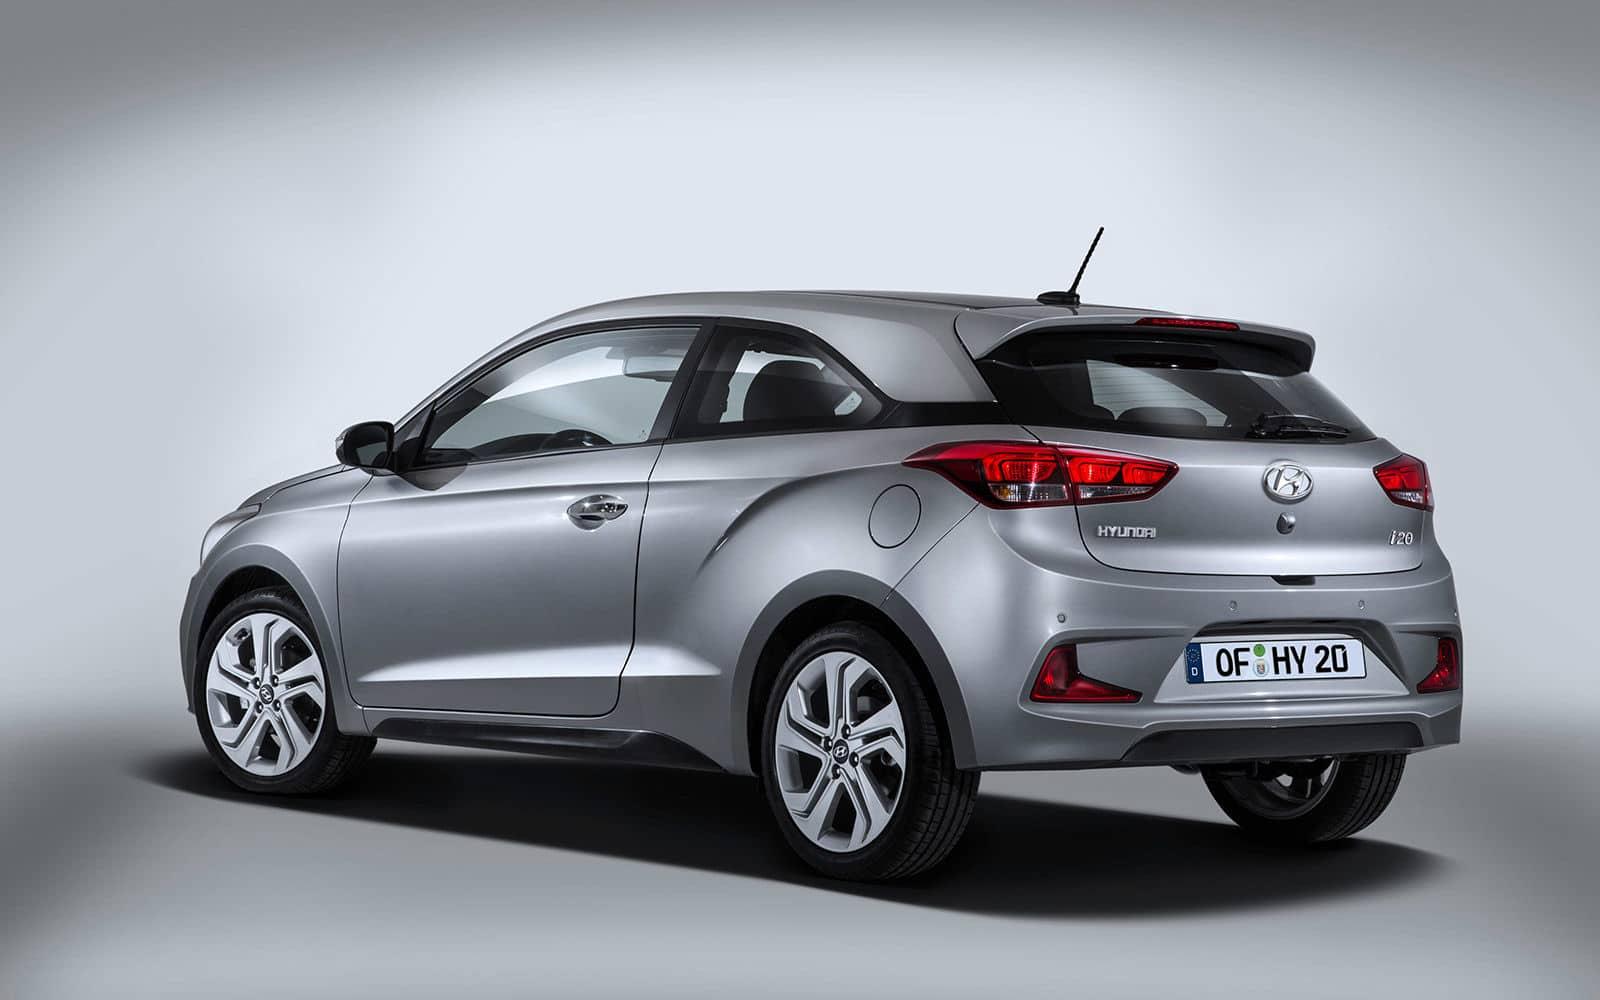 Inspektion bei einem Hyundai i20 Coupe Typ GB 2015